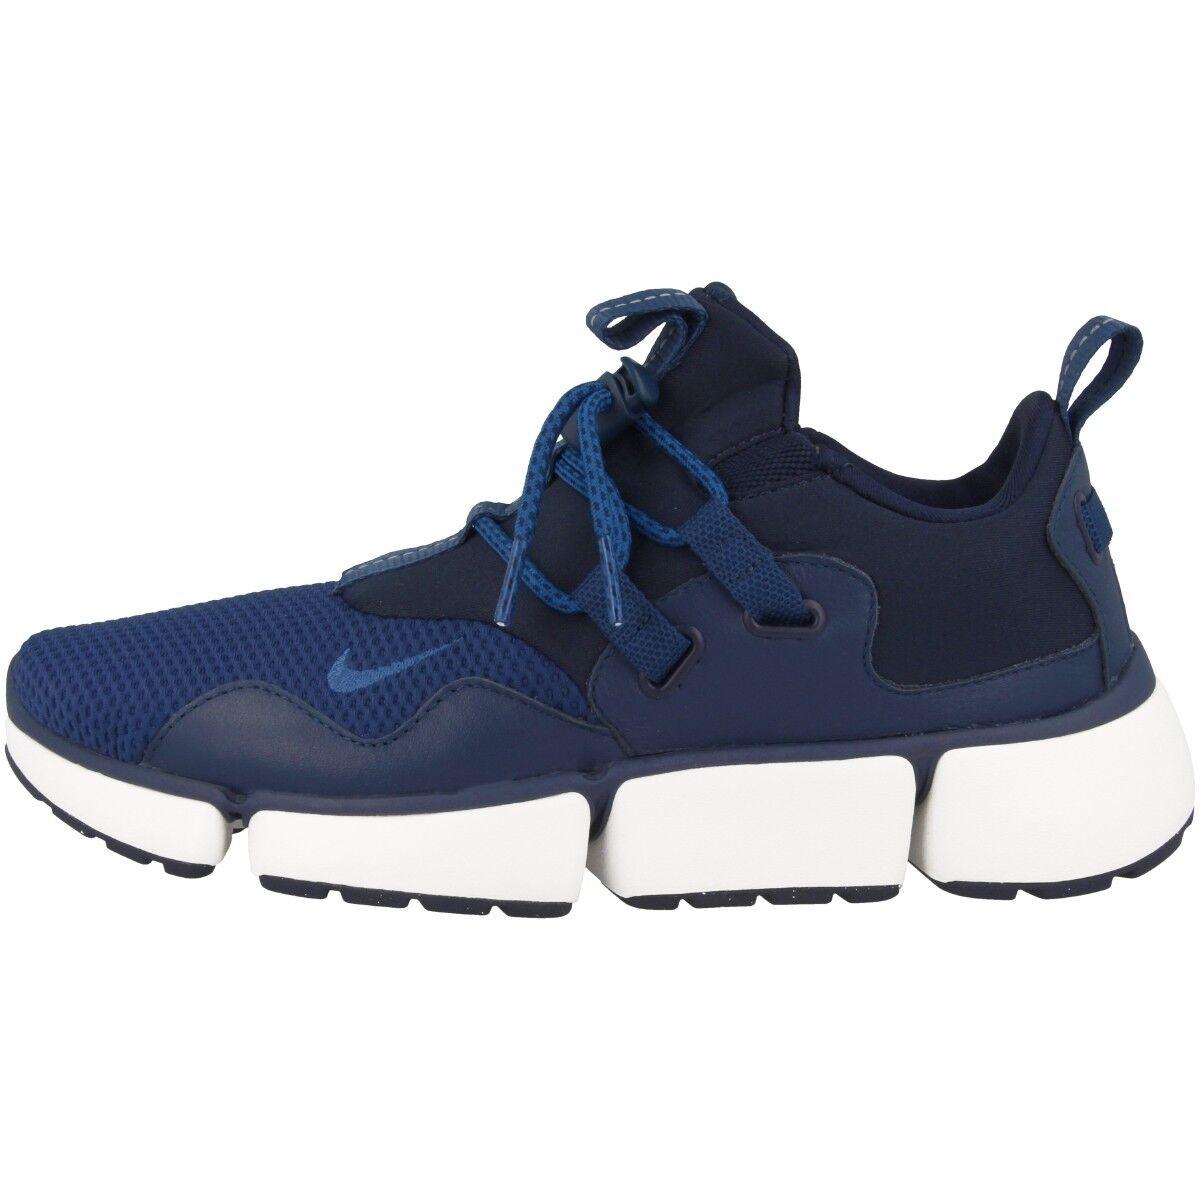 Nike coltellino proposta dm scarpe dinamica proposta coltellino scarpe scarpe blu 898033-401 9100e4